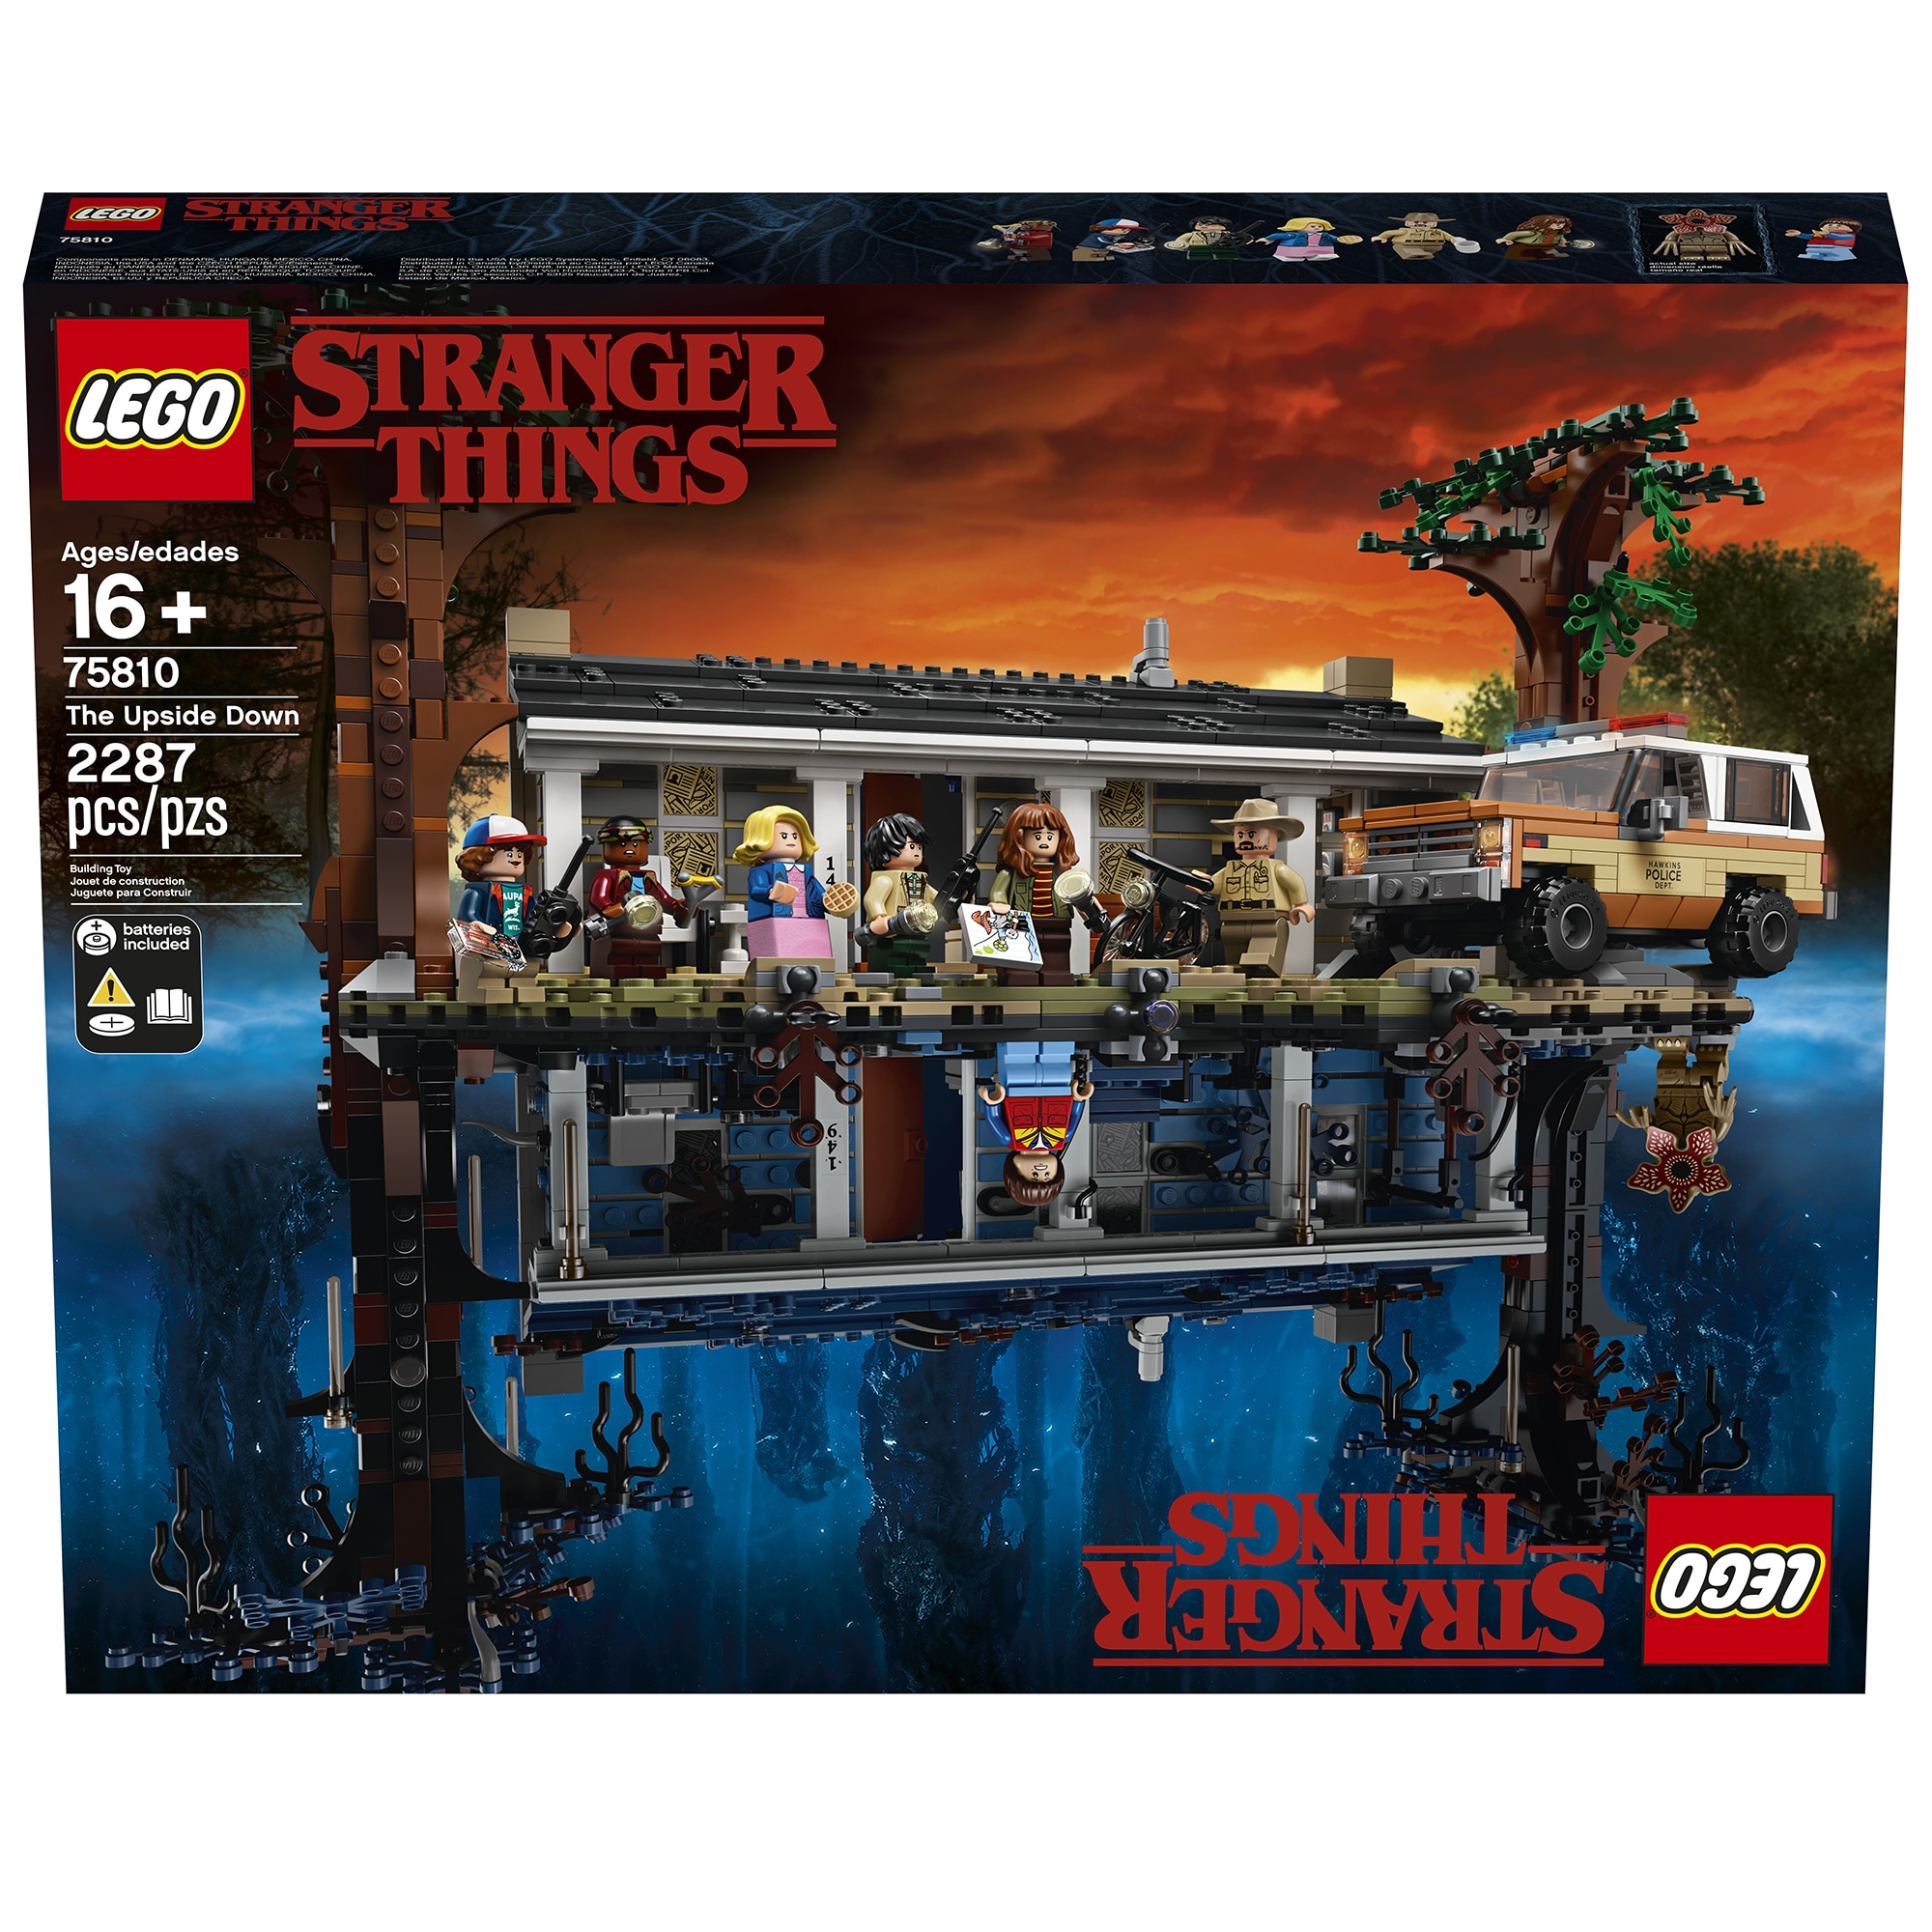 LEGO Stranger Things 75810 Foto set confezione (4)